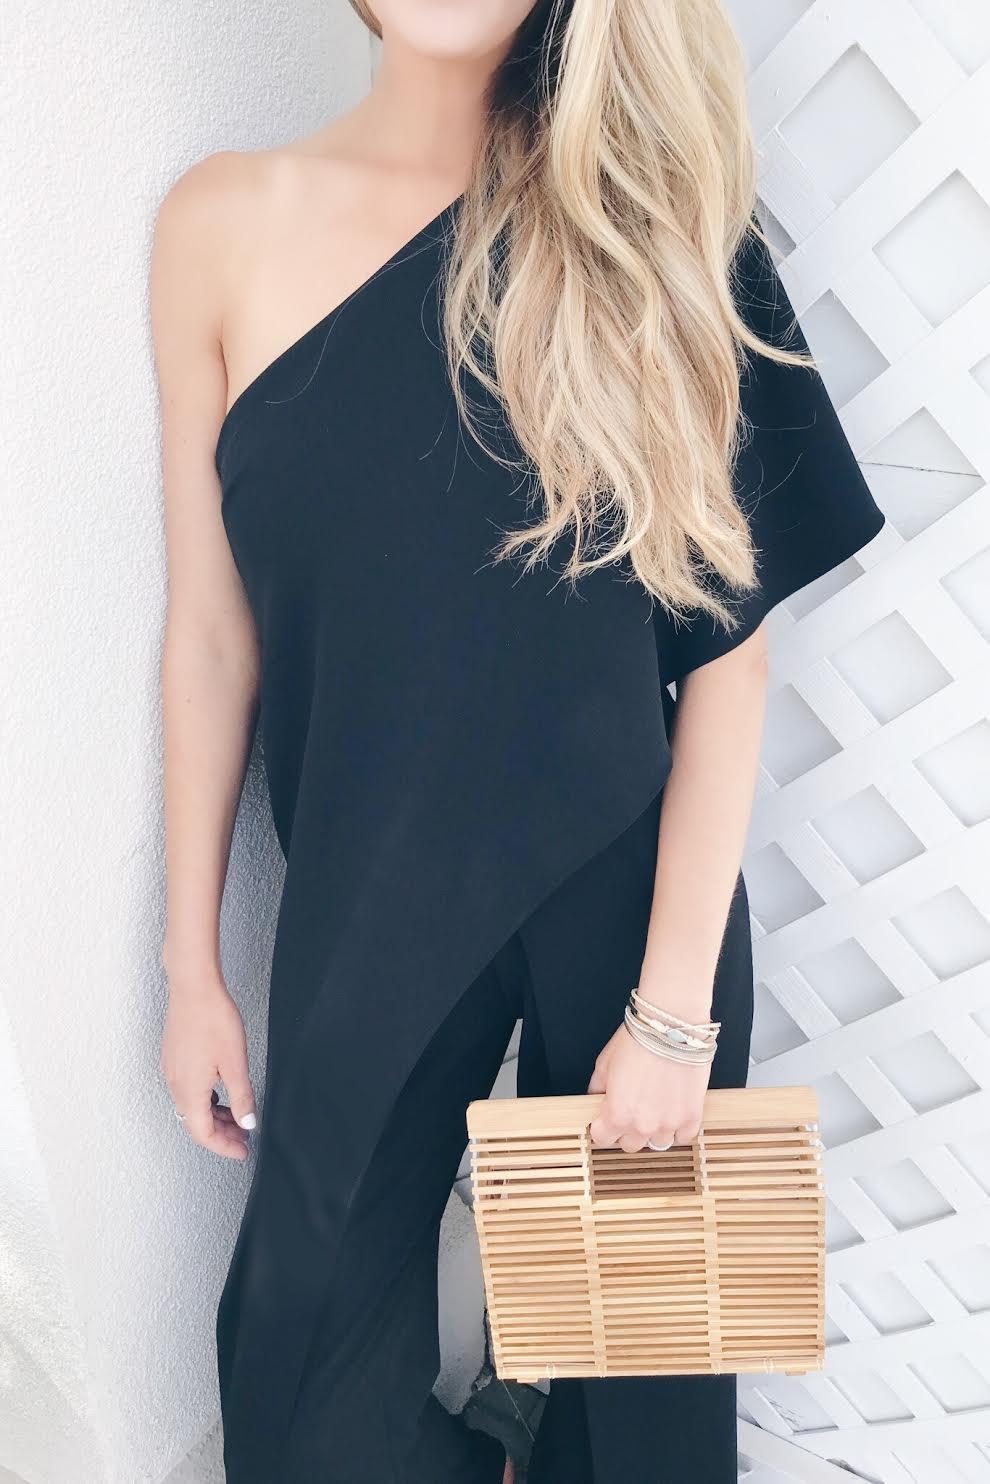 black formal jumpsuit for wedding guest attire on pinteresting plans connecticut fashion blog